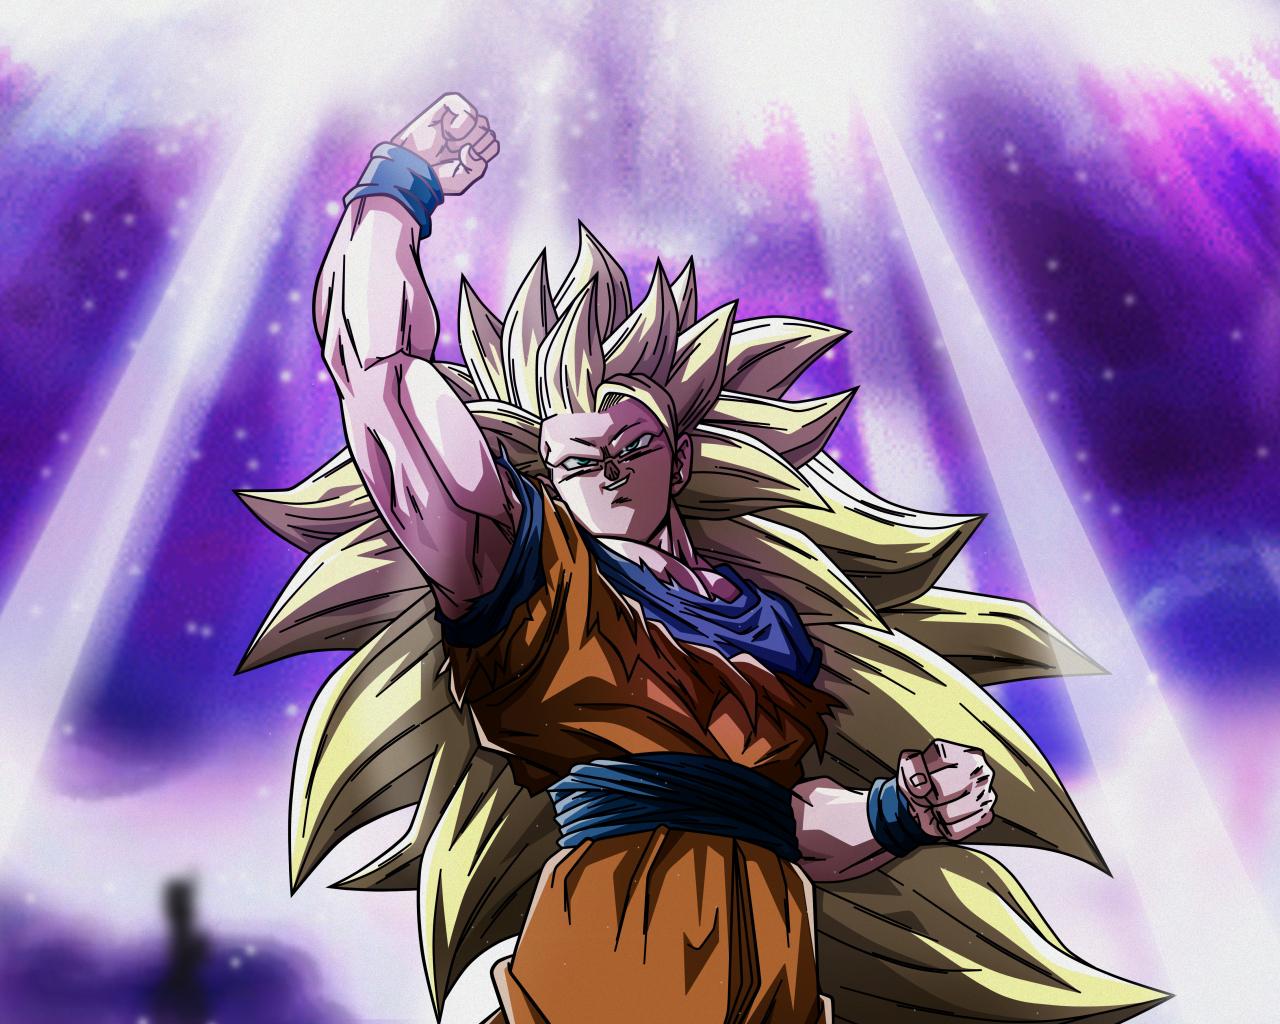 Download 1280x1024 Wallpaper Goku Super Saiyan Anime Dragon